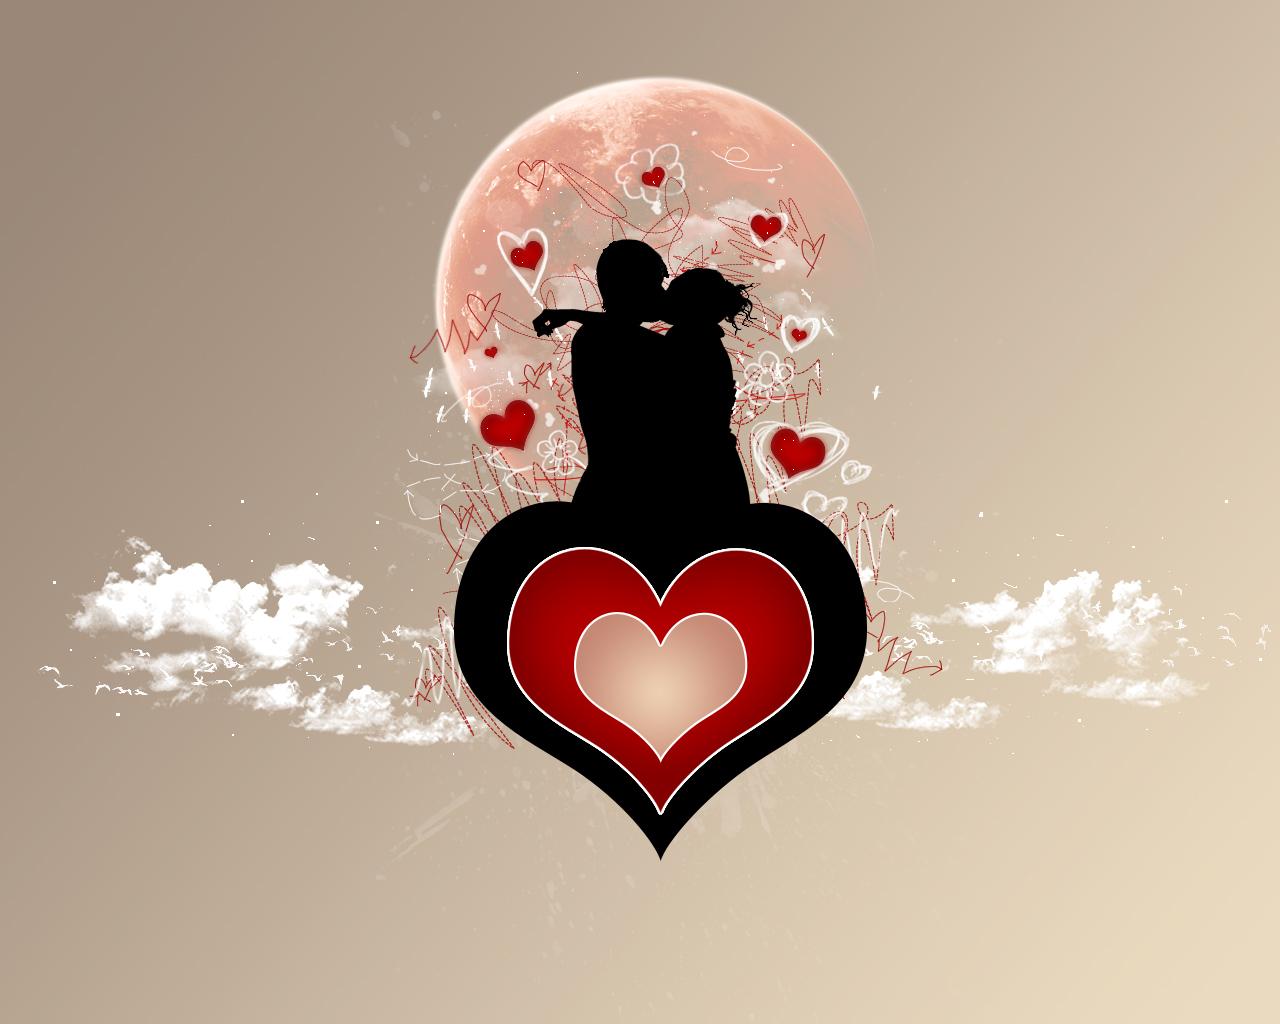 http://fc01.deviantart.com/fs16/f/2007/199/0/6/One_Love_by_Dimentichisi.jpg